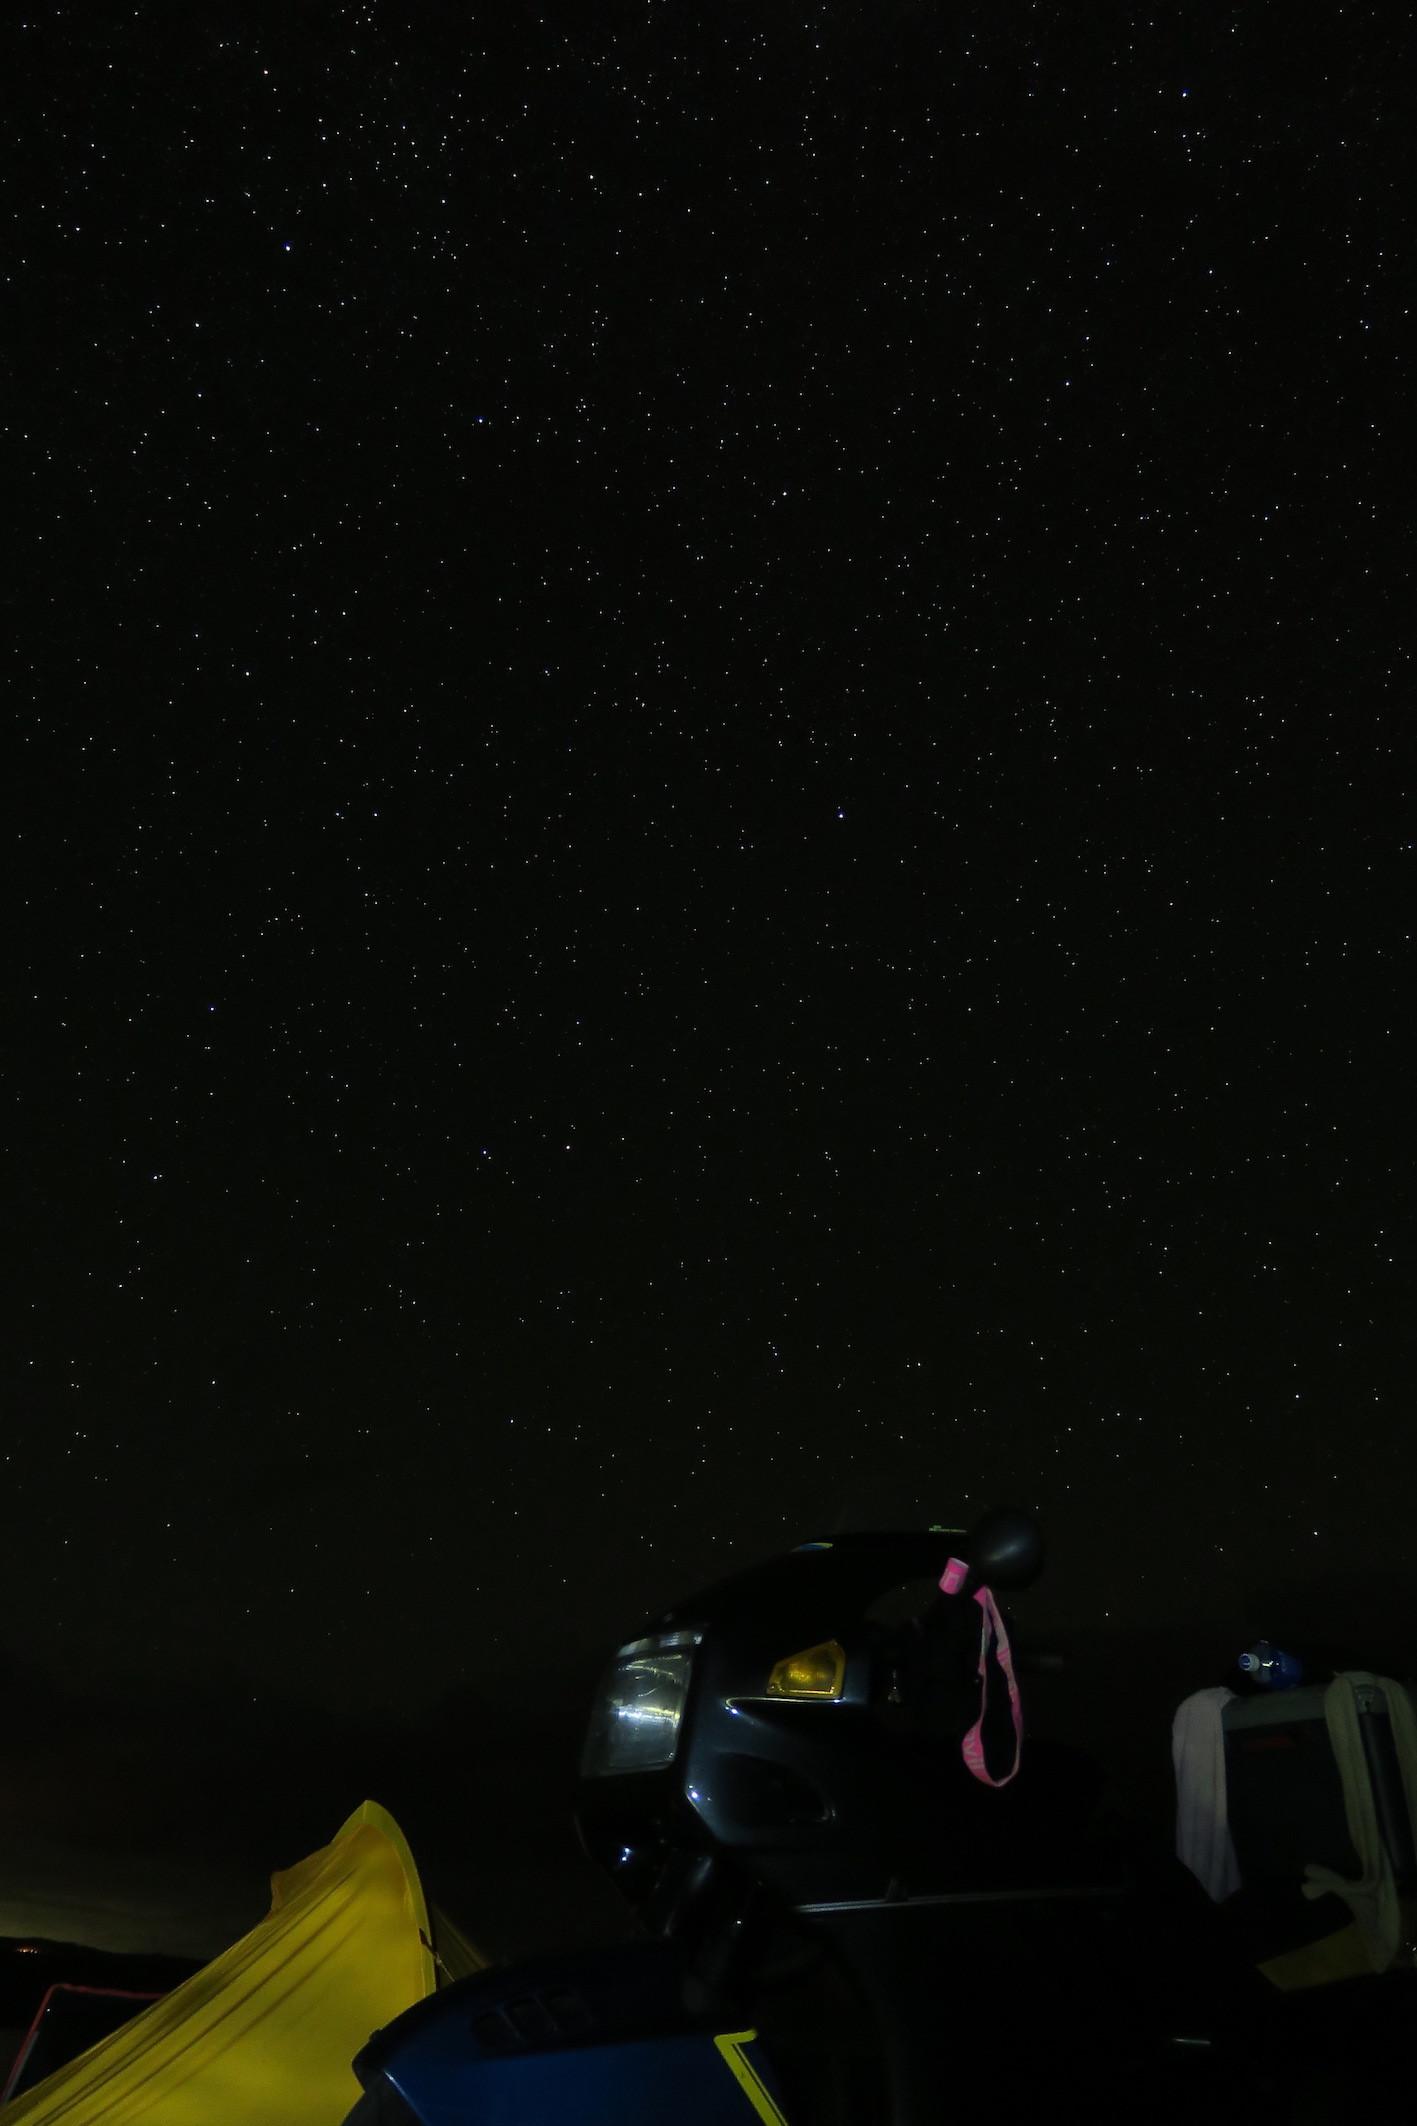 【K1】屈斜路の空に、星を願ってツーリング(第4話)_e0159646_08243149.jpg